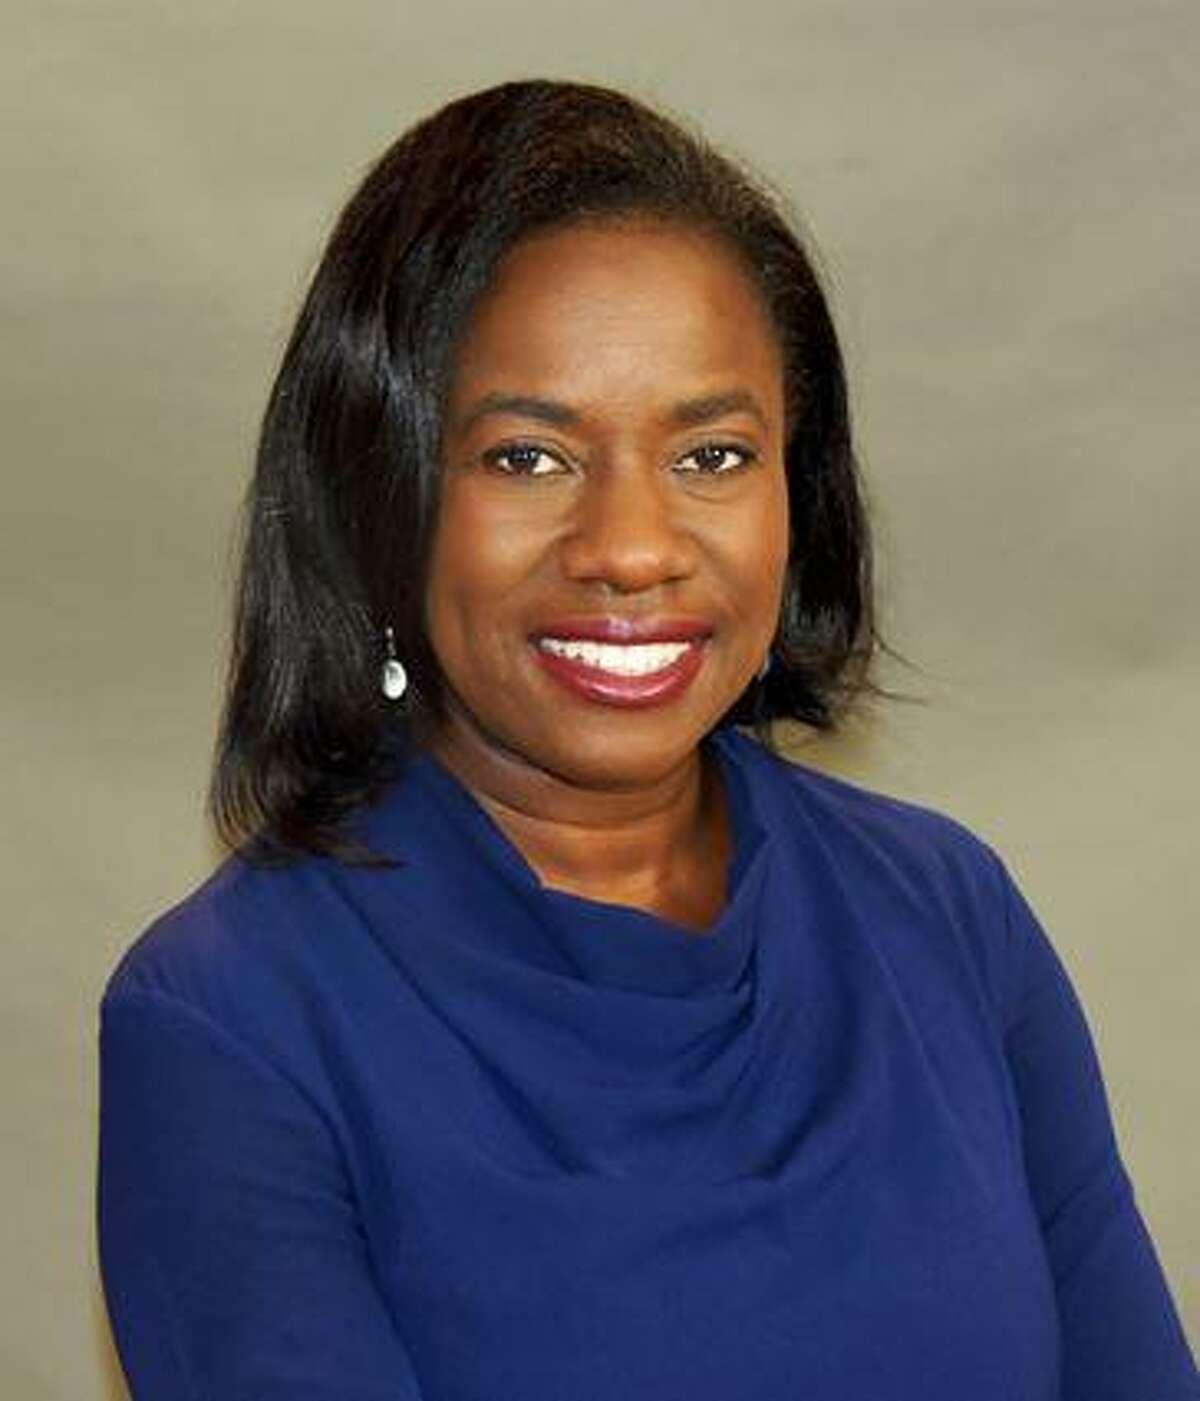 Assistant U.S. Attorney Ndidi Moses